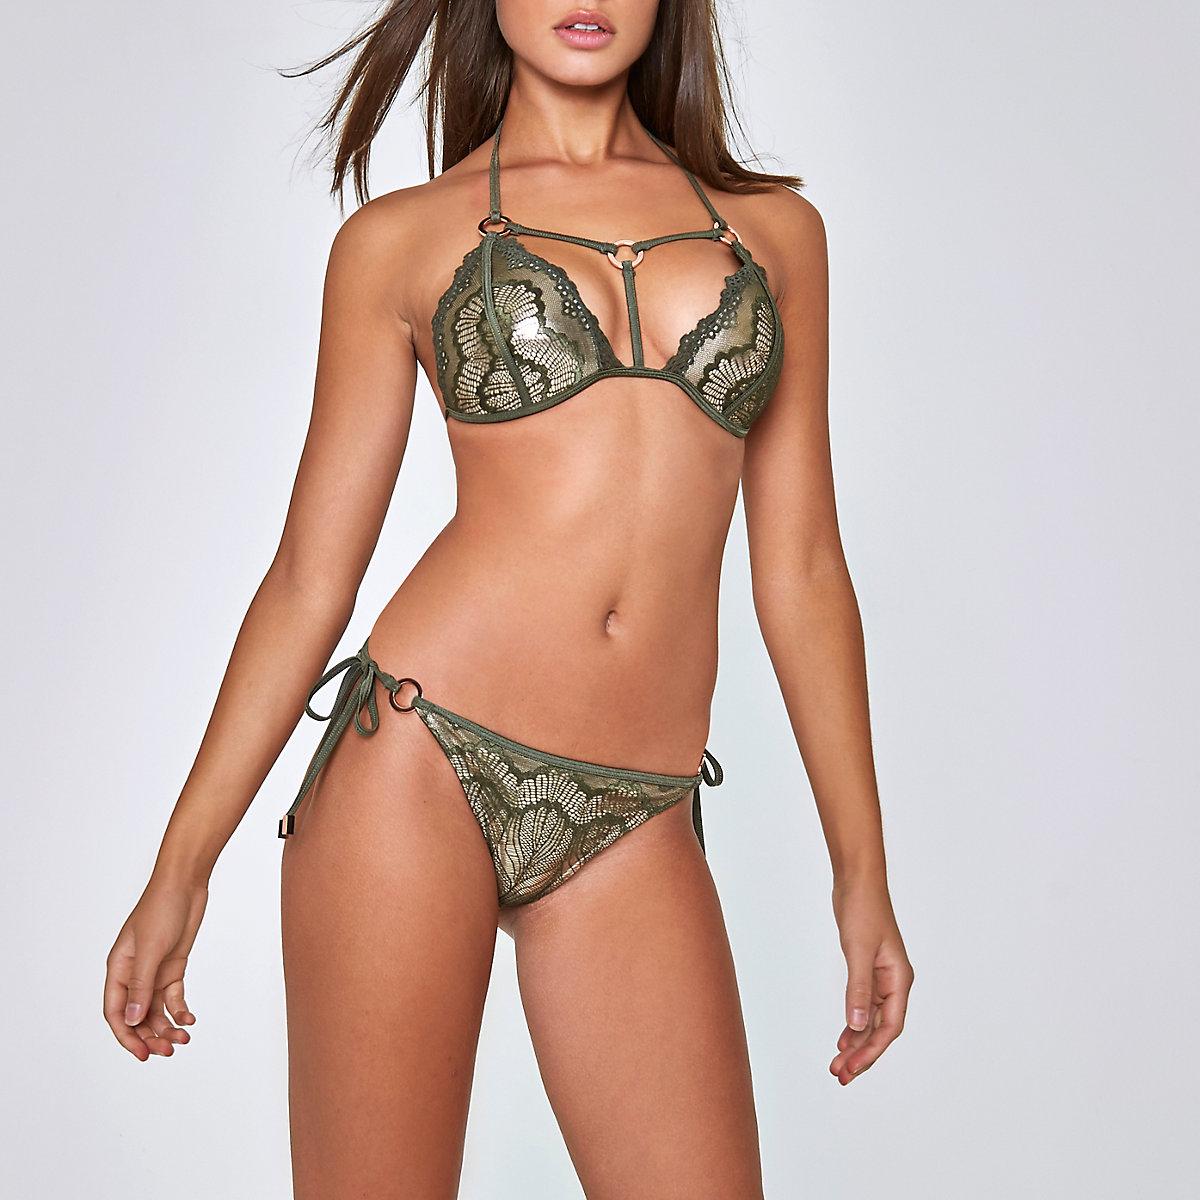 Khaki green lace tie side bikini bottoms